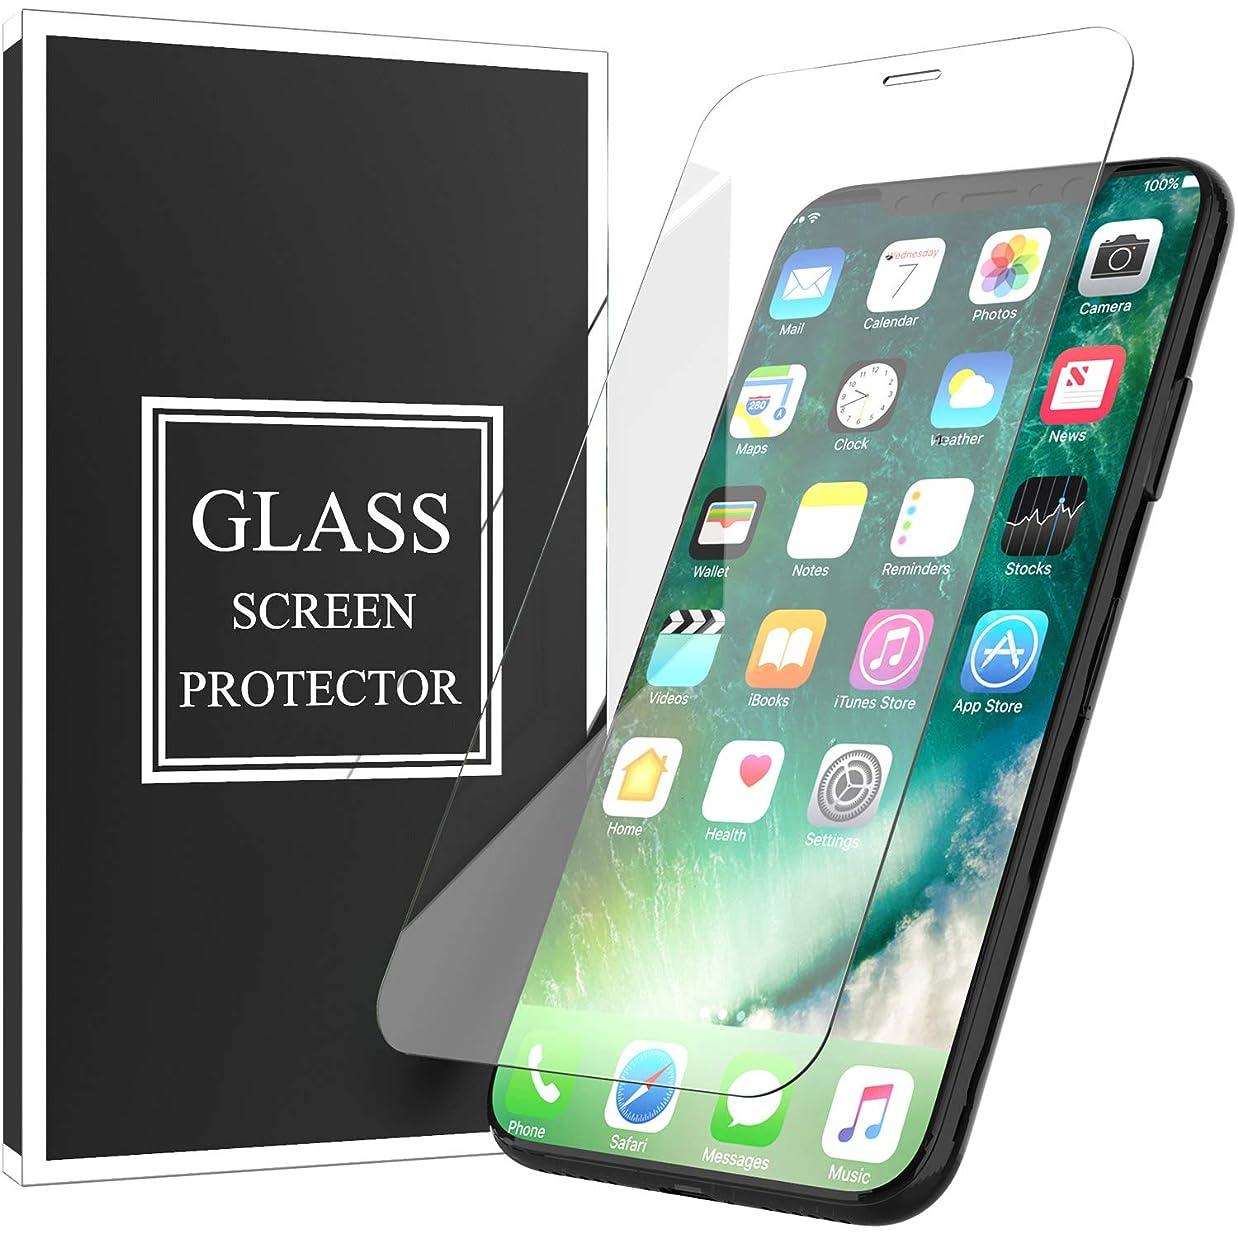 iPhoneX iPhoneXS ガラスフィルム 硬度9H 指紋防止 気泡レス 飛散防止 高透過率 【3枚セット】 耐衝撃